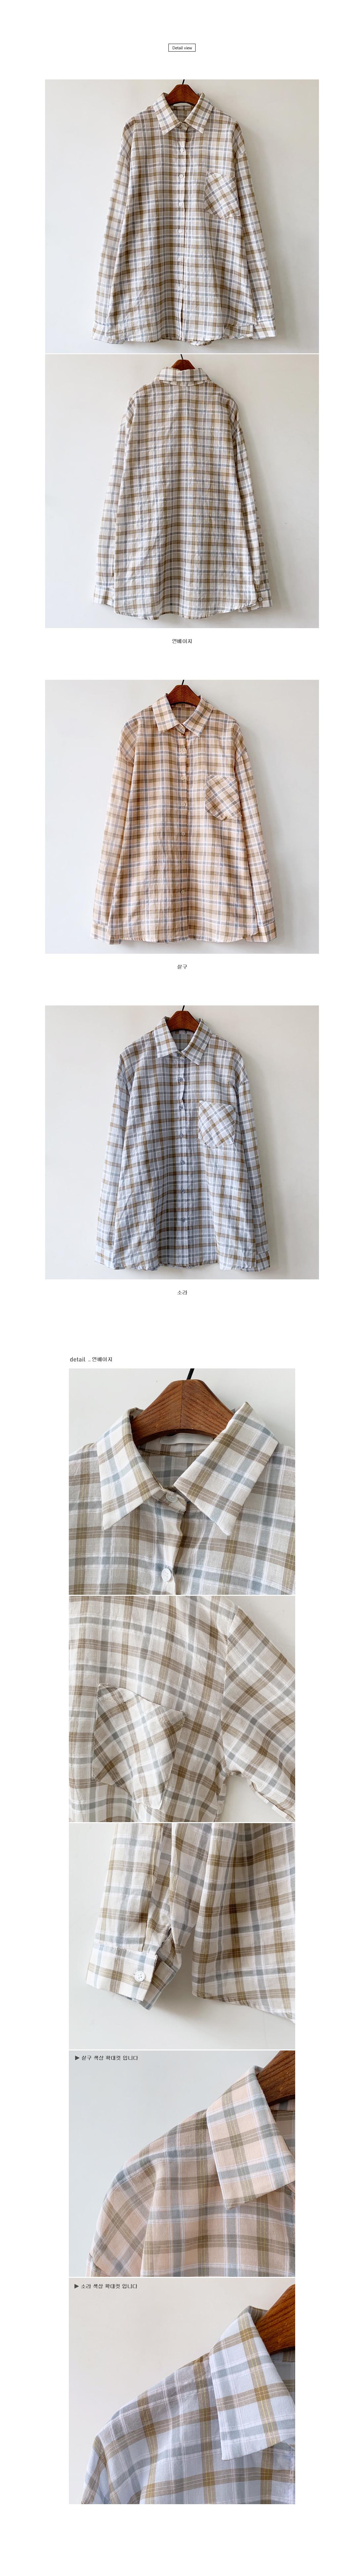 Find Summer Check Shirt